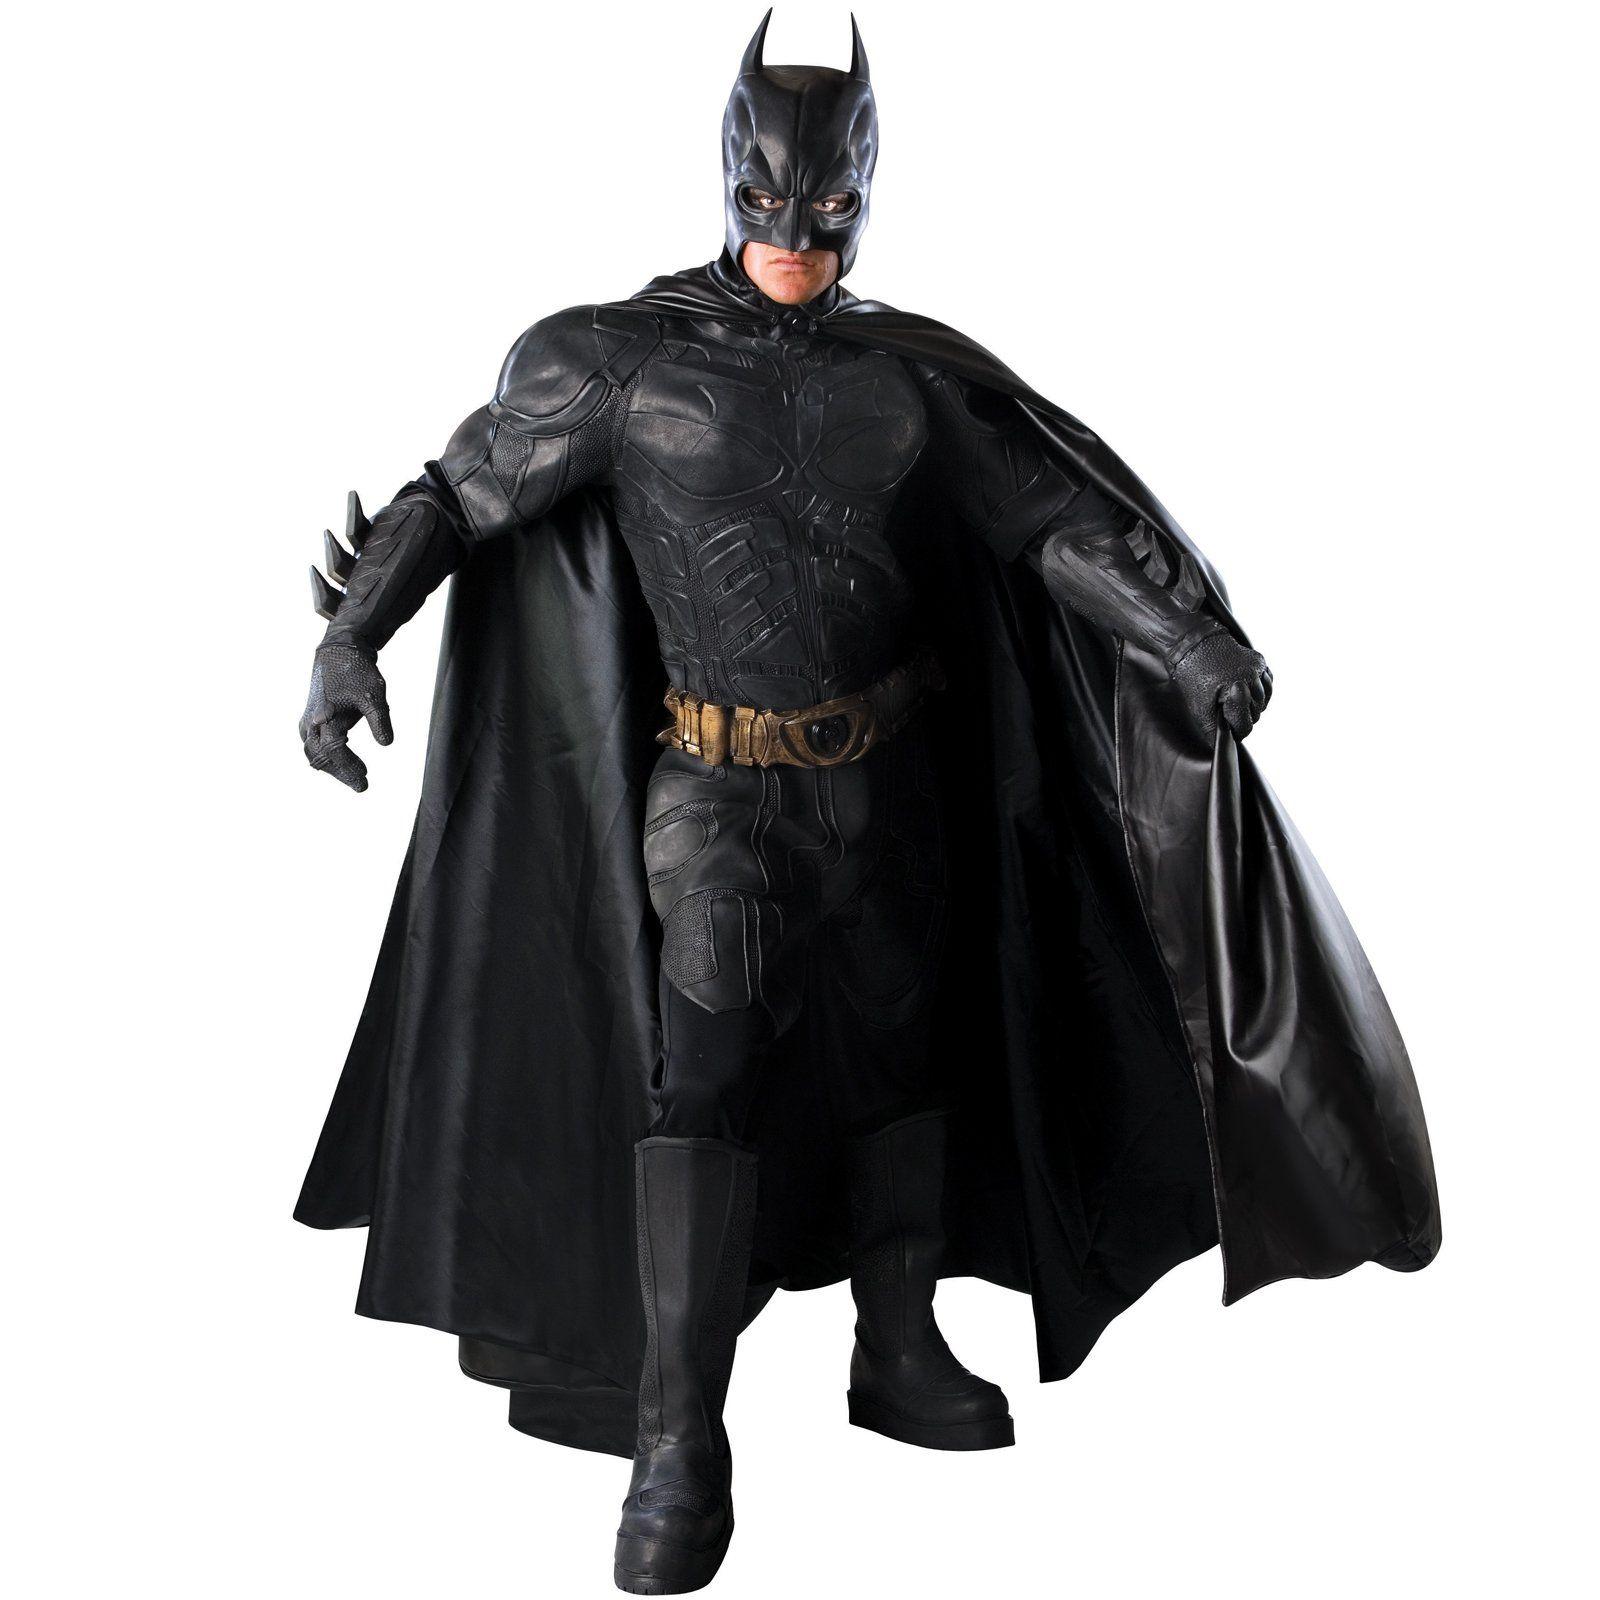 BLACK CAPE AND MASK ADULTS SUPERHERO FANCY DRESS COSTUME UNISEX COMIC FILM HERO